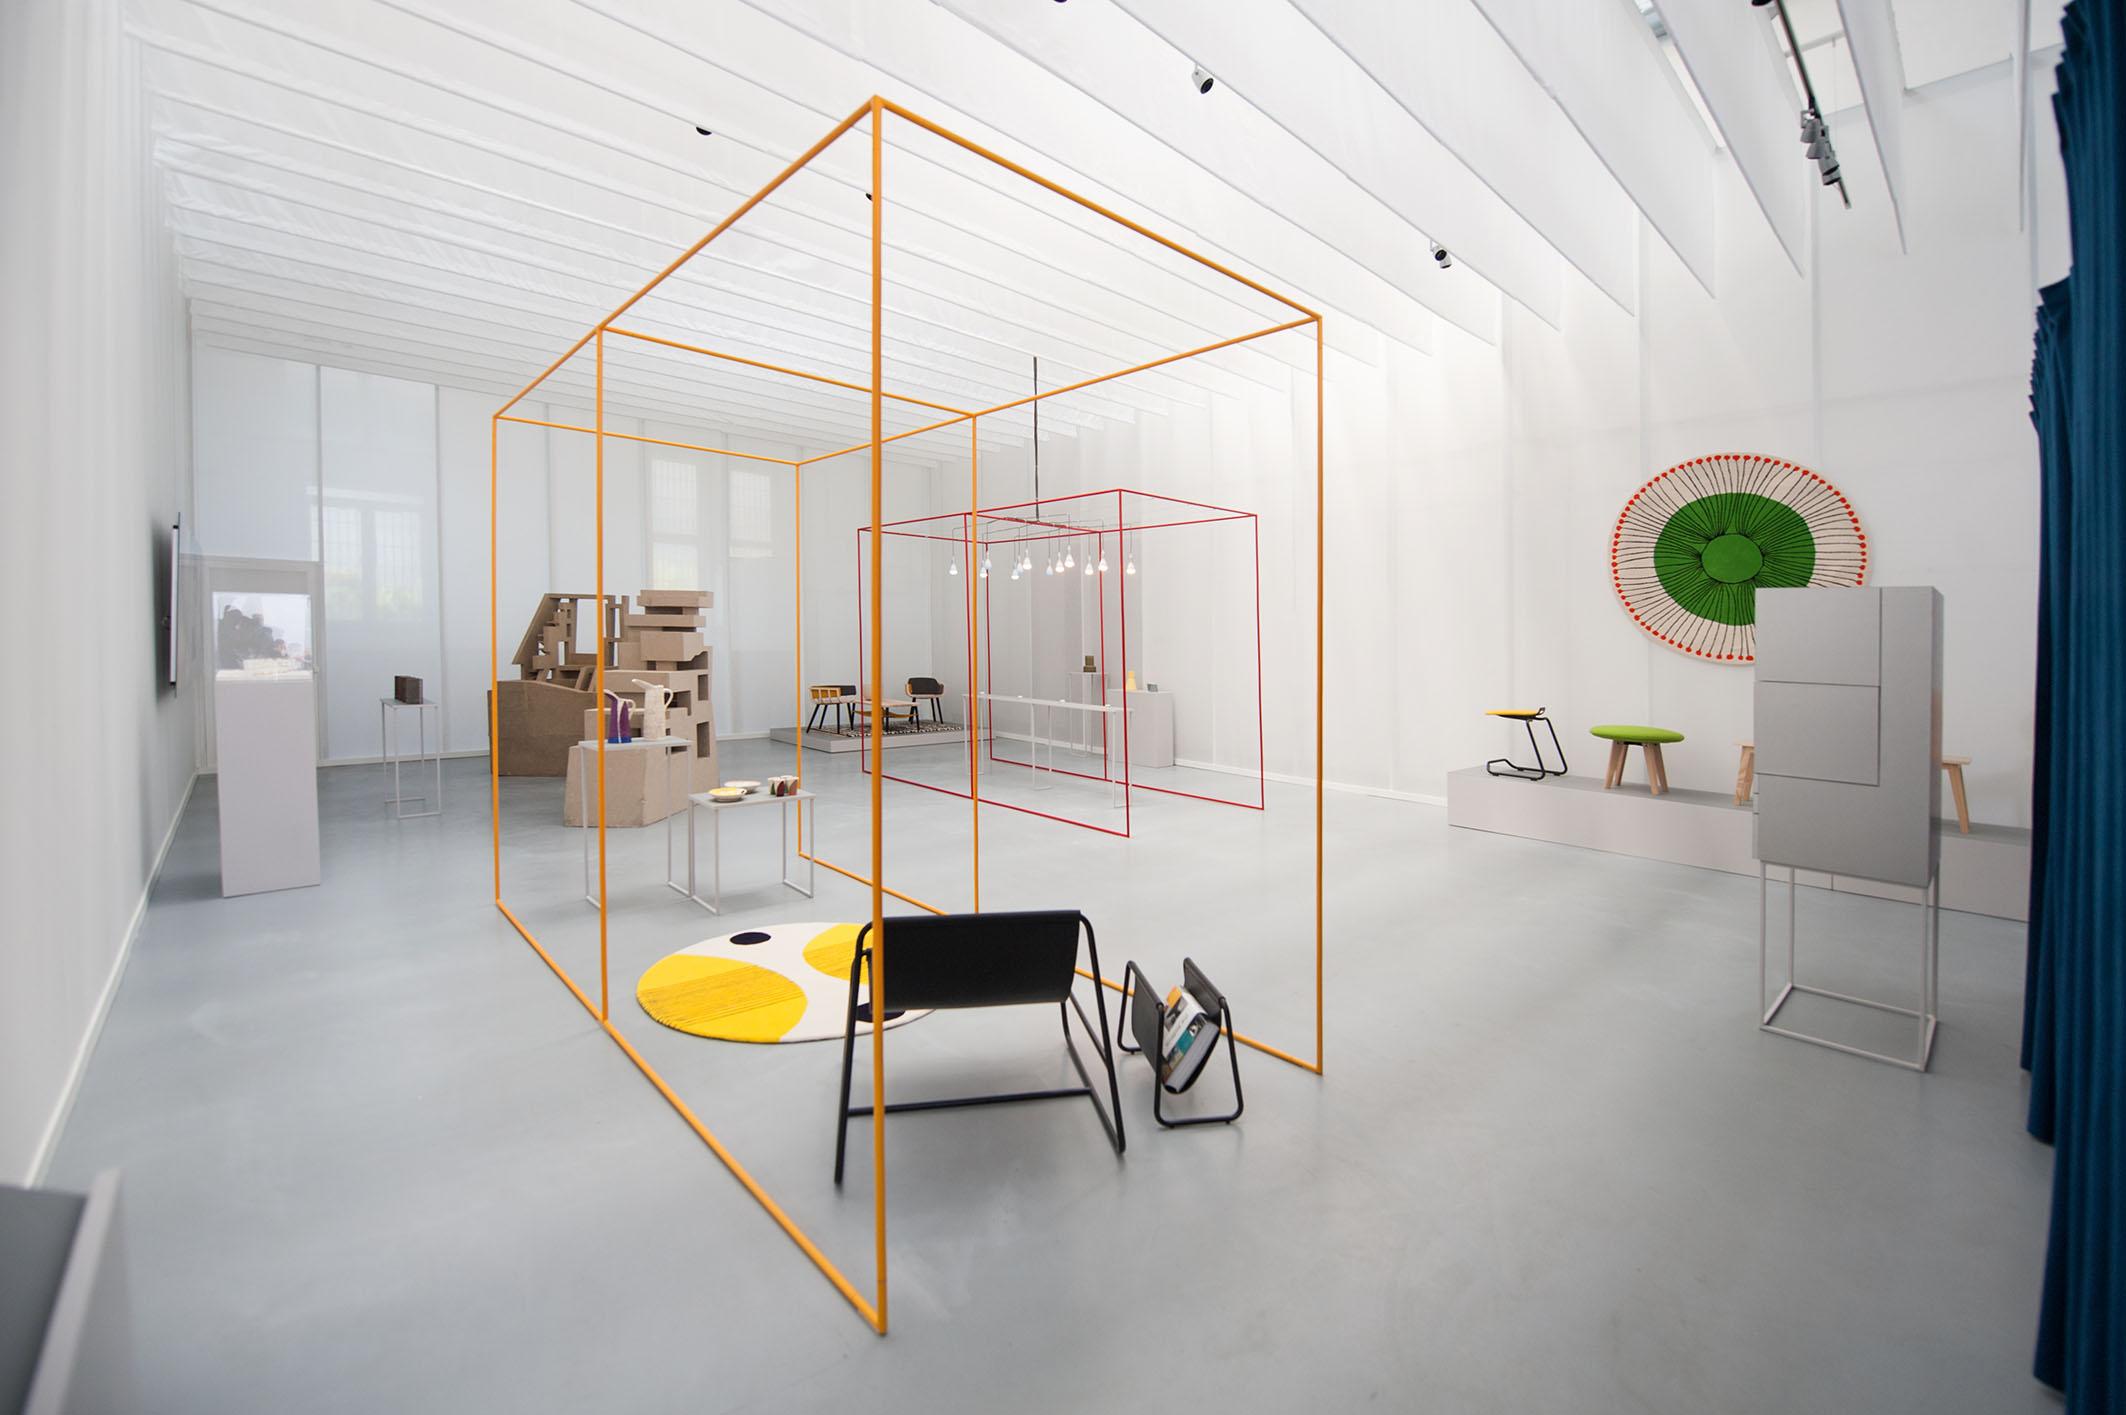 Liminal_Irish design at the threshold_Inaugural exhibition at Fuori Salone_ID2015_PR